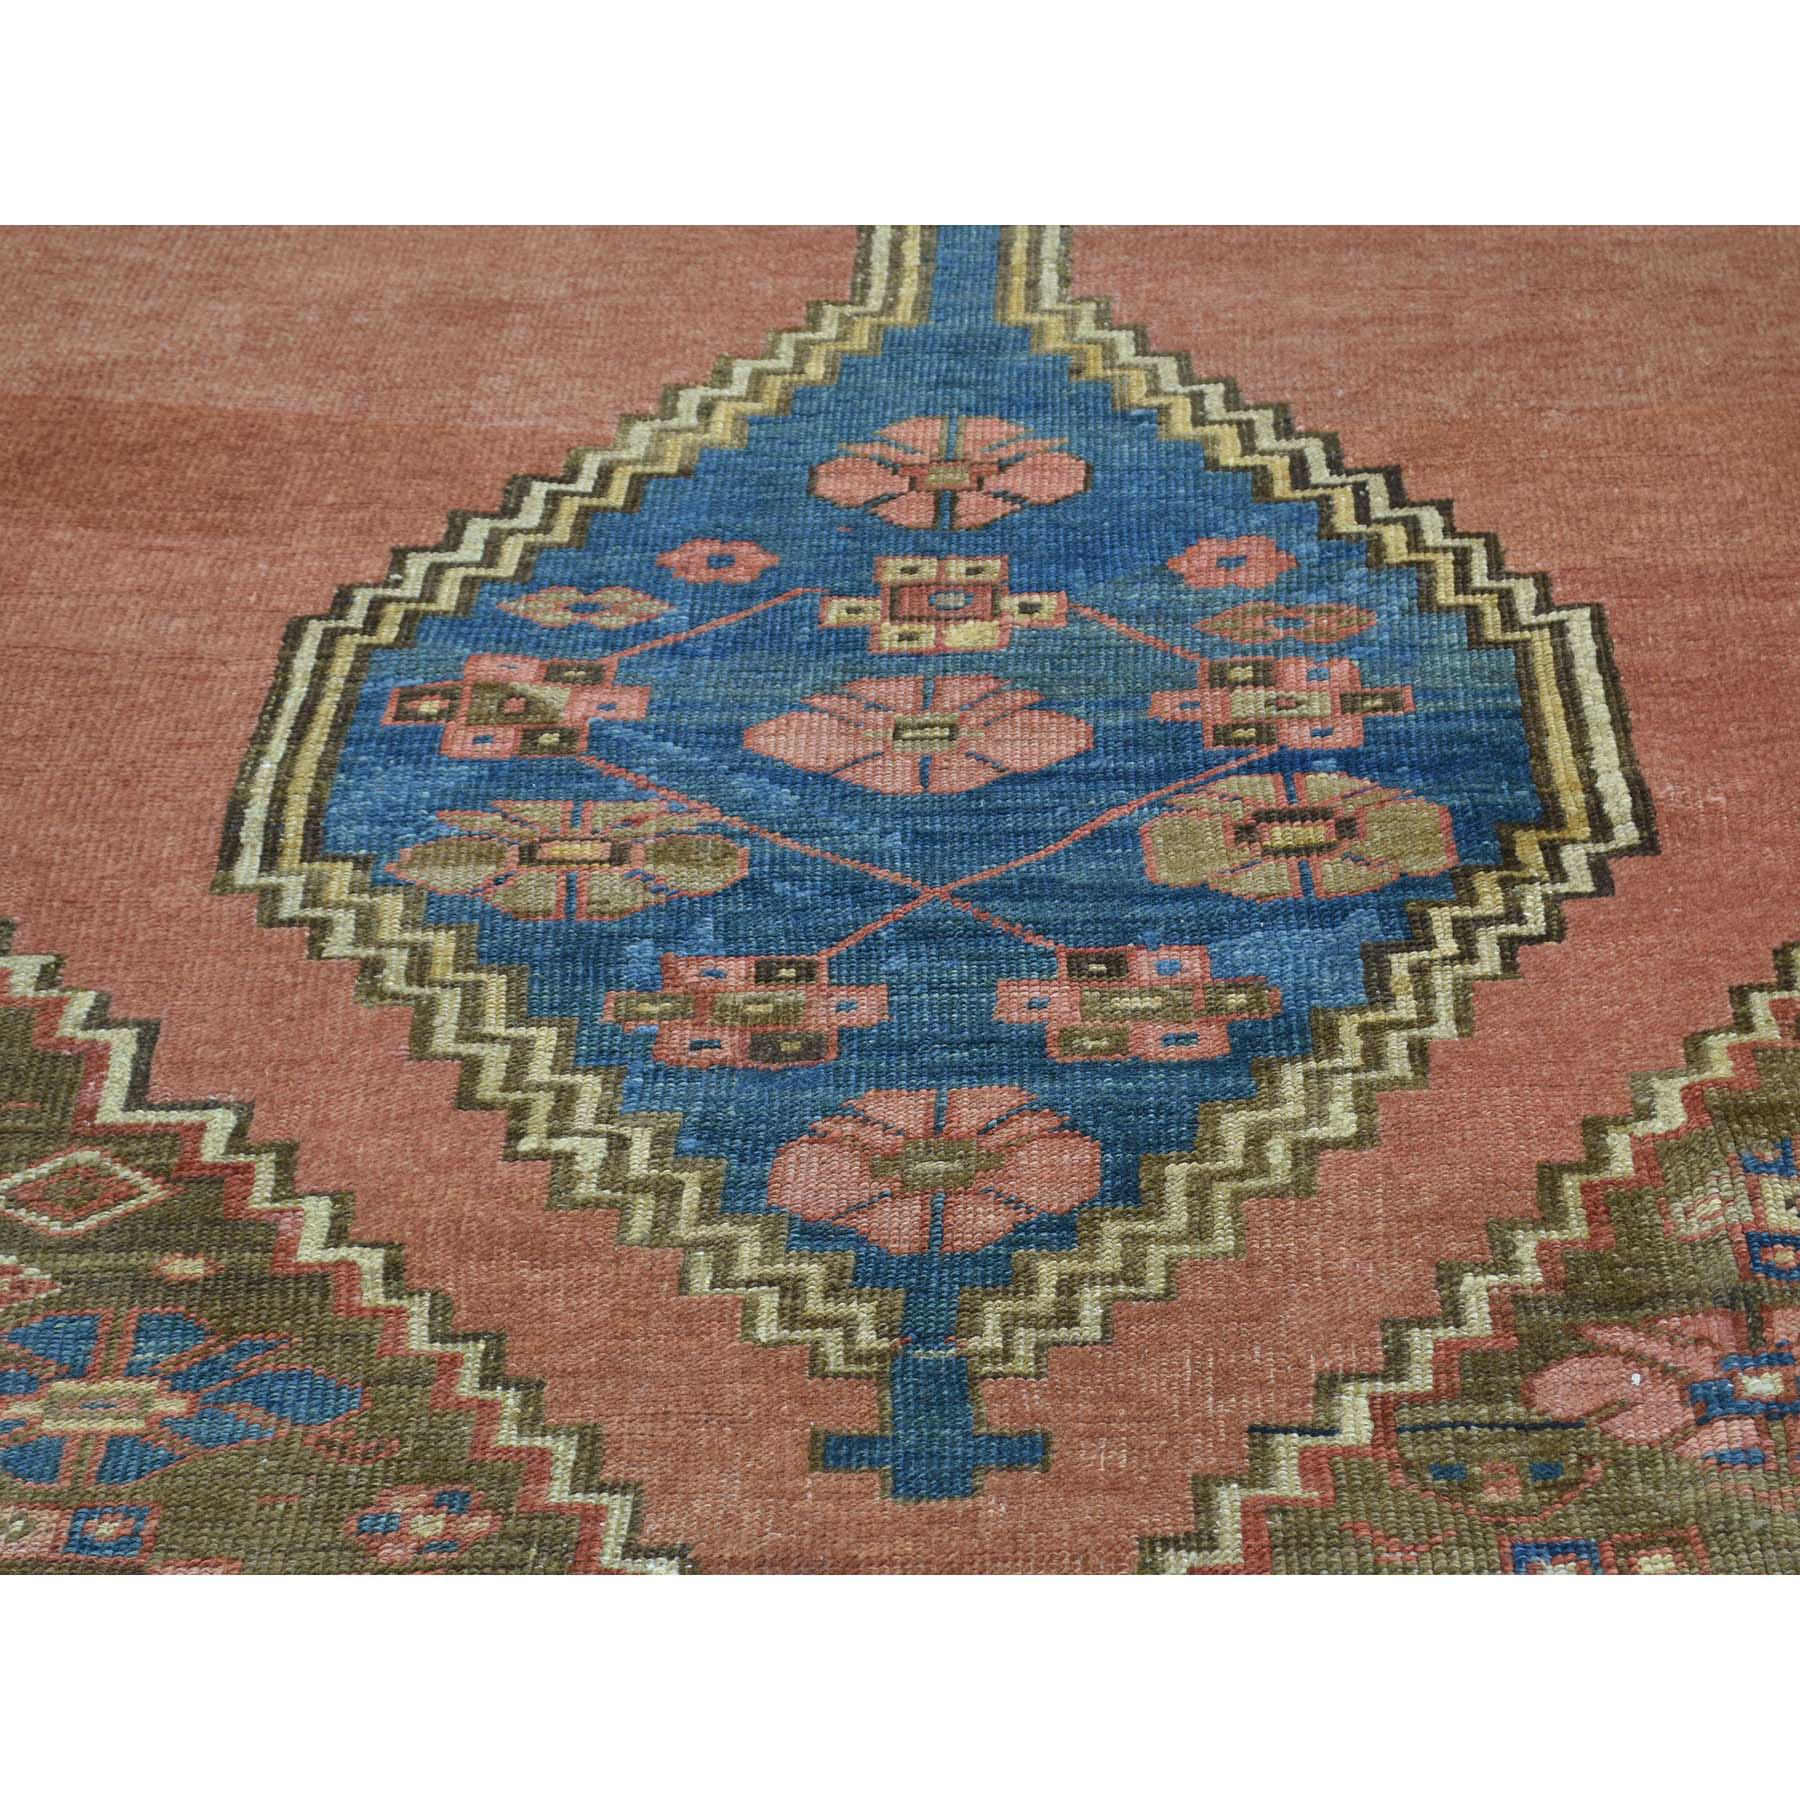 10-8 x14-1  Handmade Original Antique Persian Bakshaish Mint Cond Rug